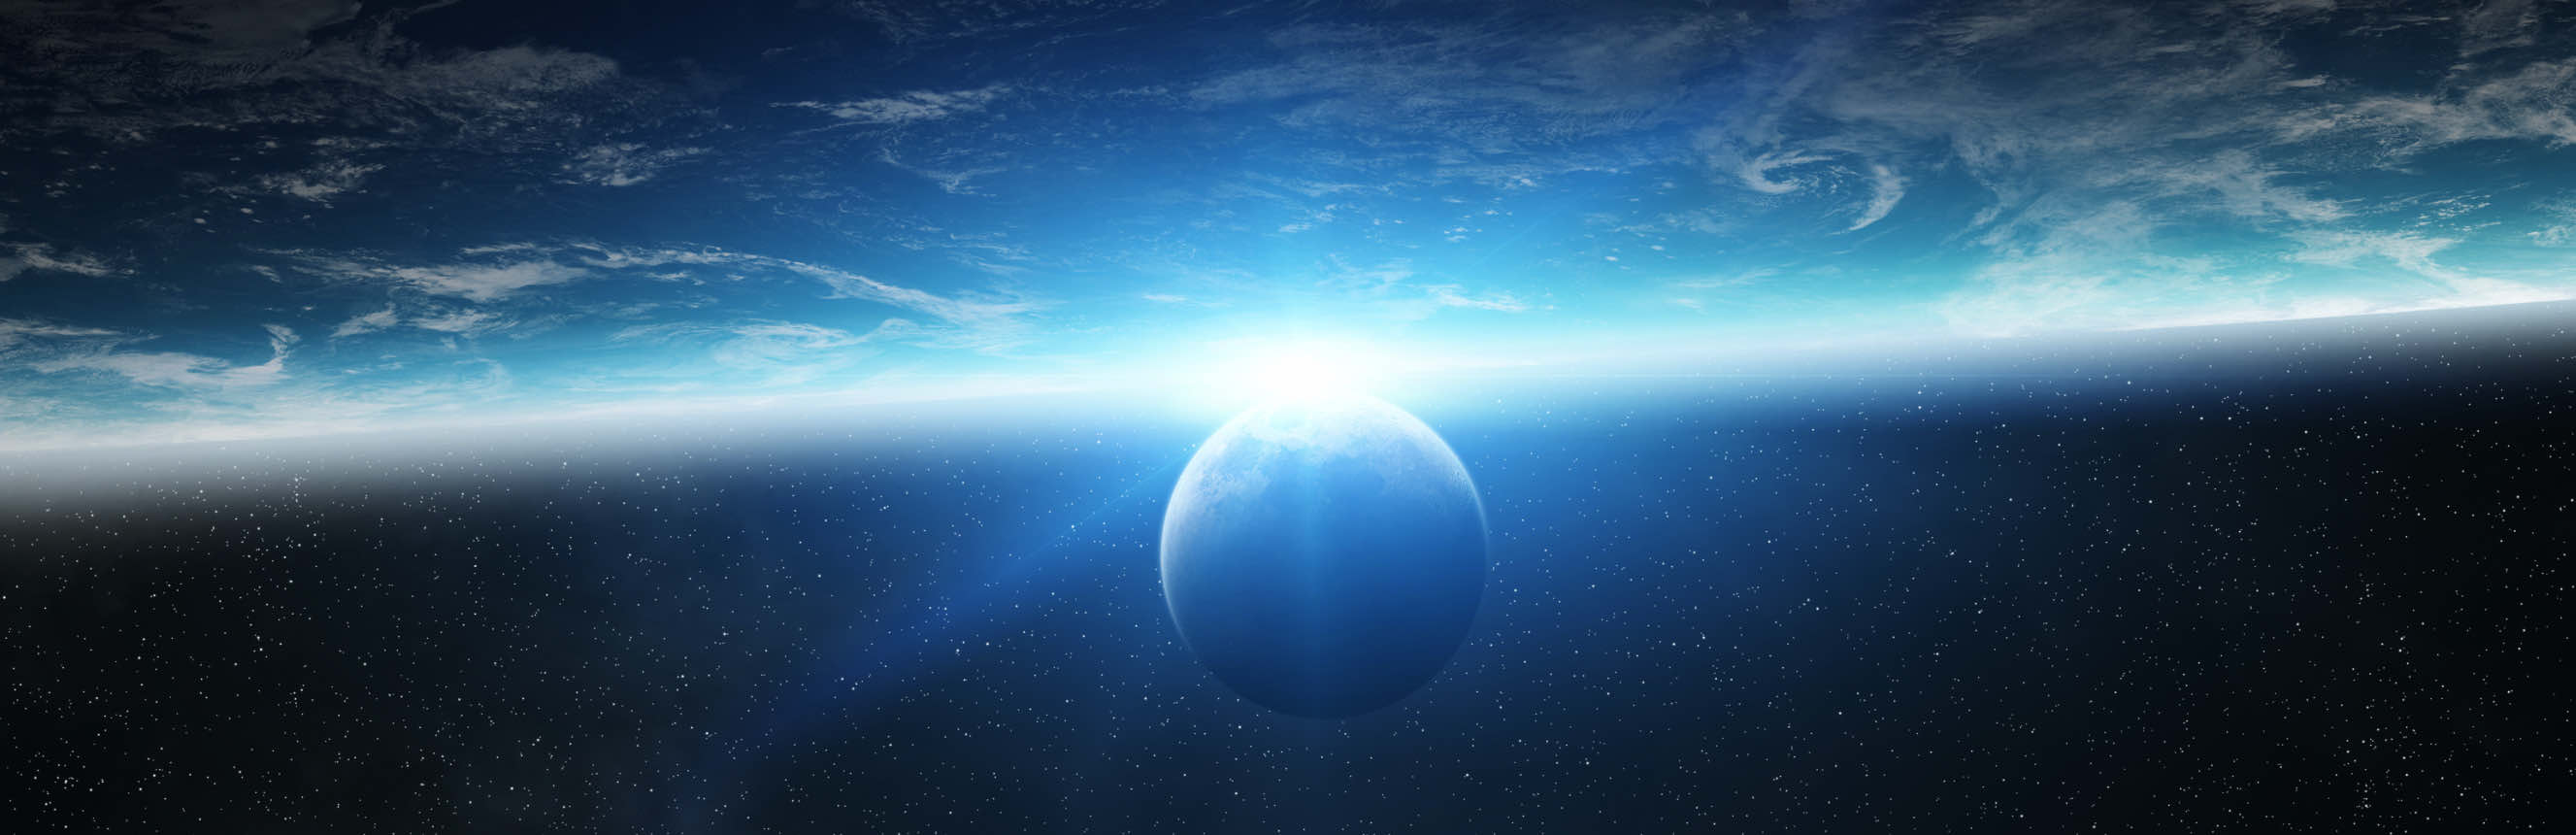 N.G.Wolmer. 2020 Didysis astrologinis mėnulio kalendorius